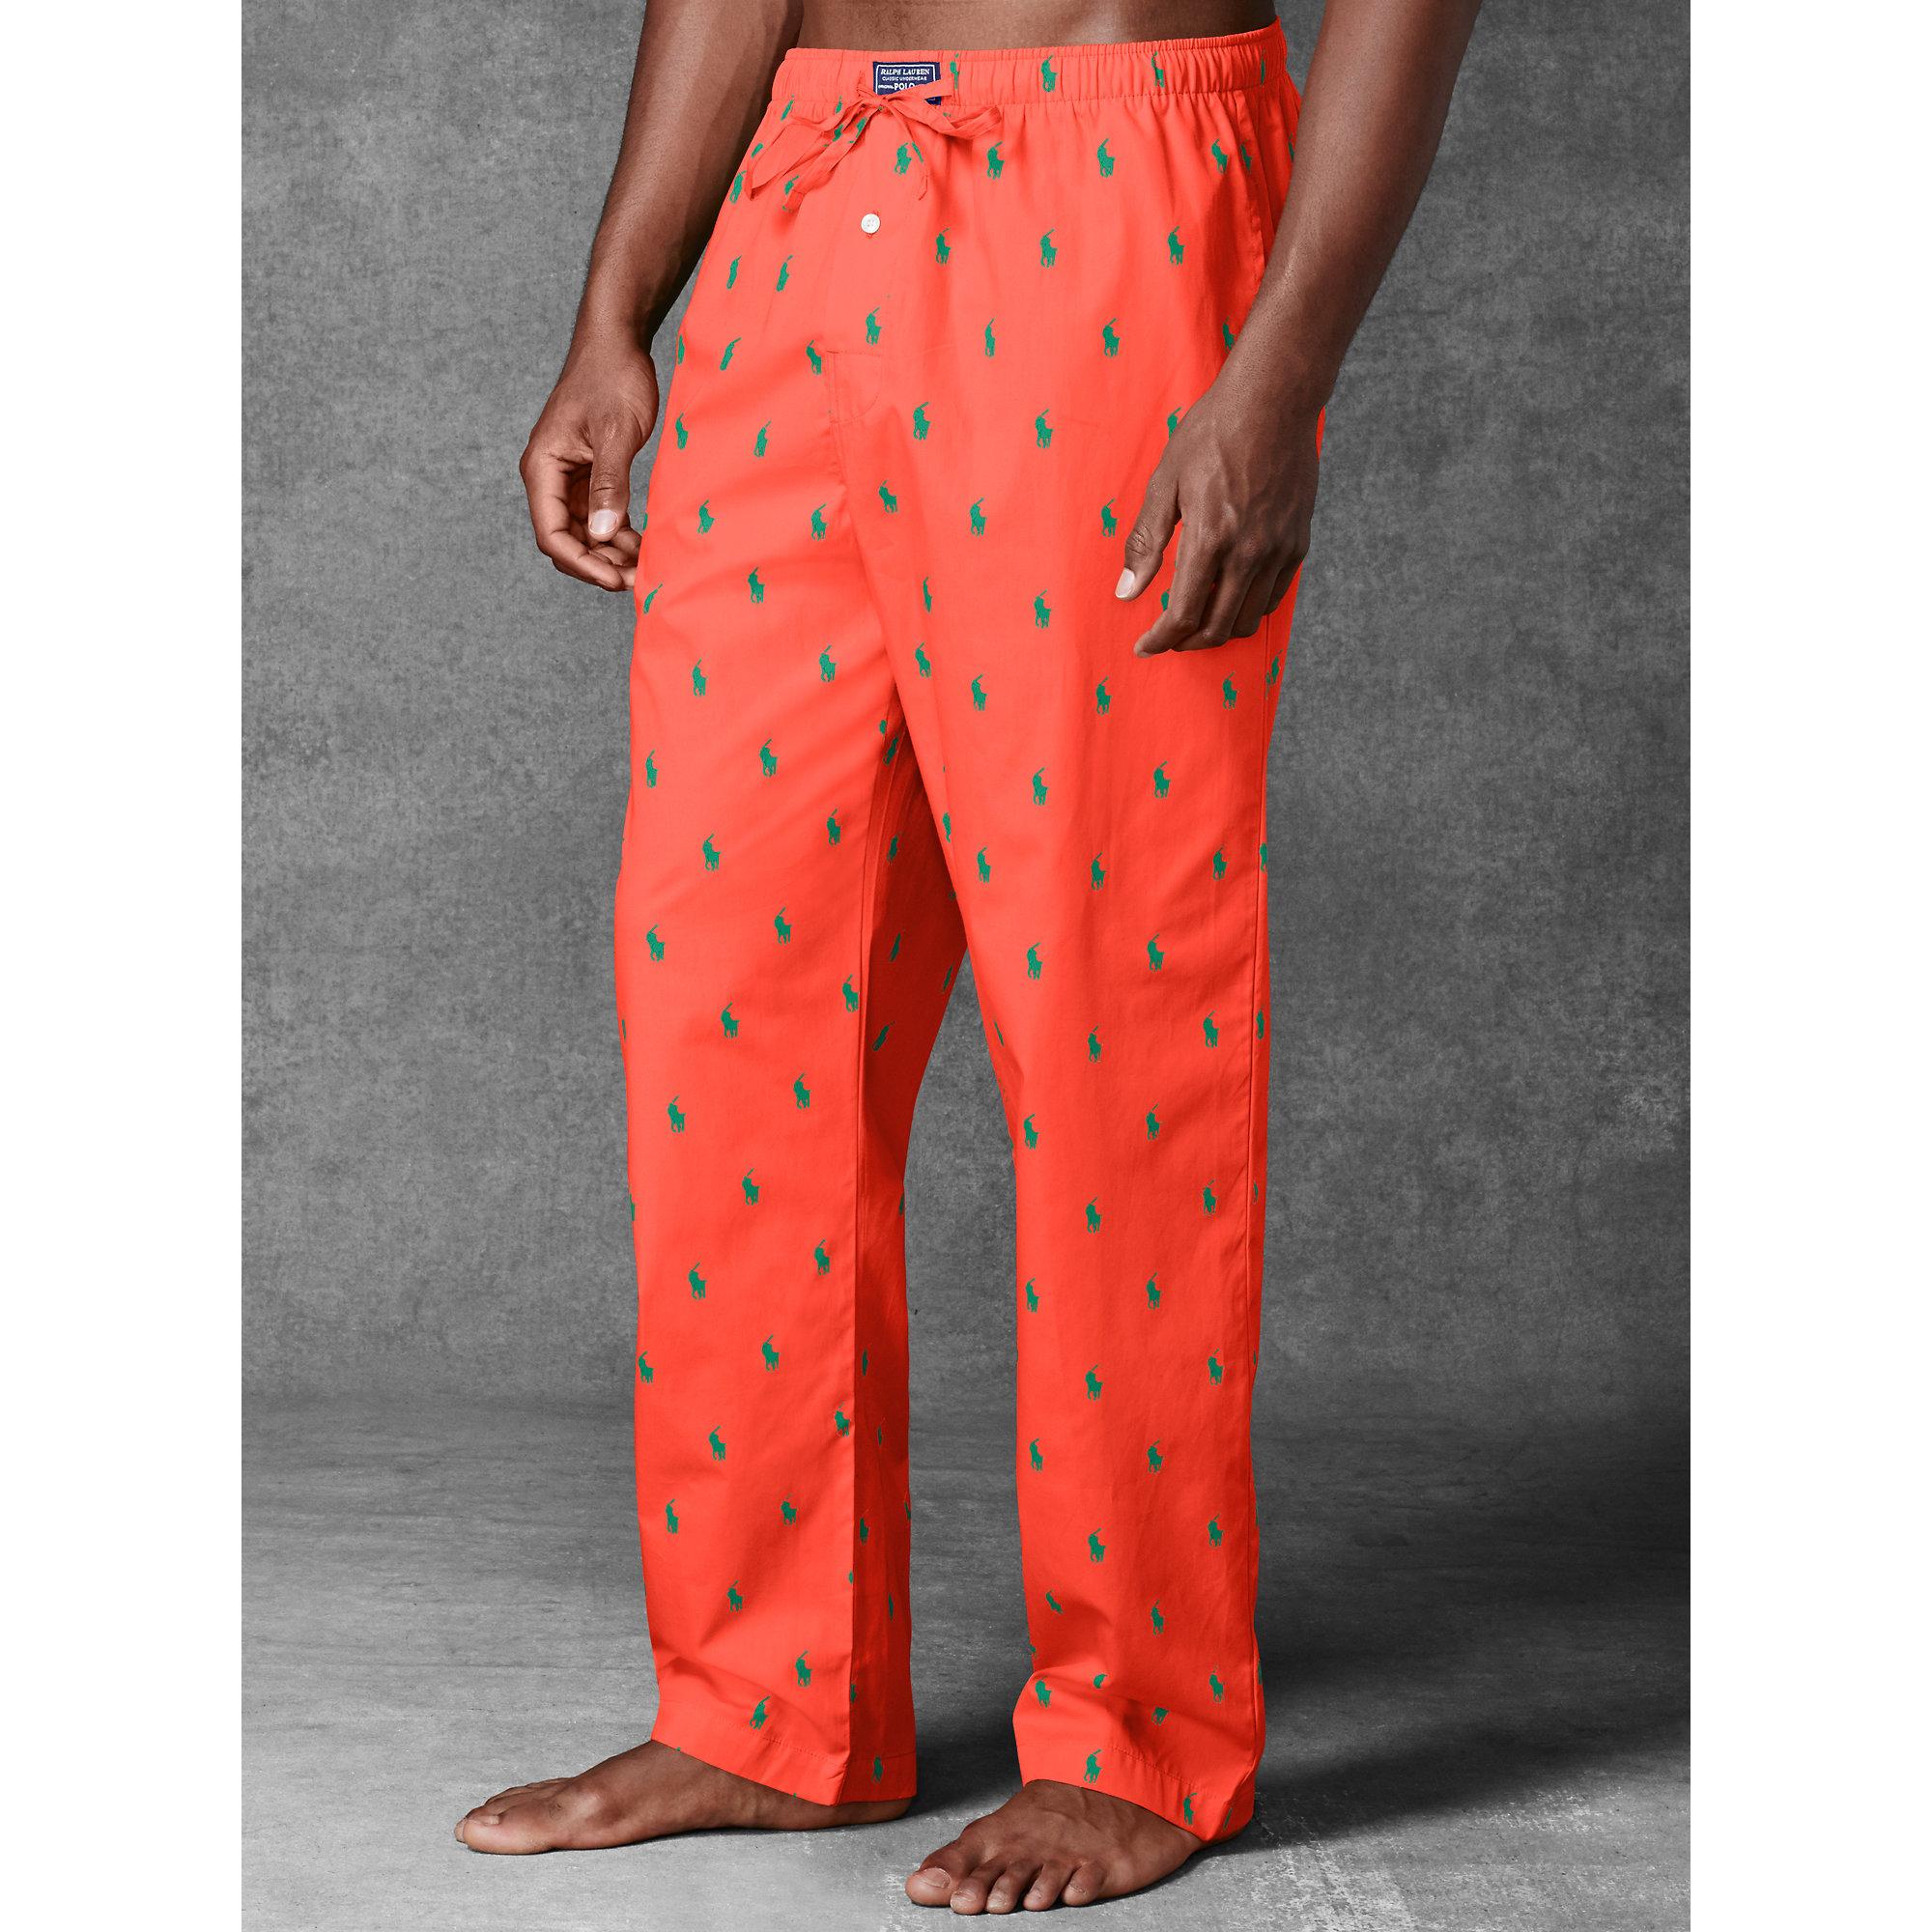 456510f9c Polo Ralph Lauren Allover Pony Sleep Pant in Orange for Men - Lyst